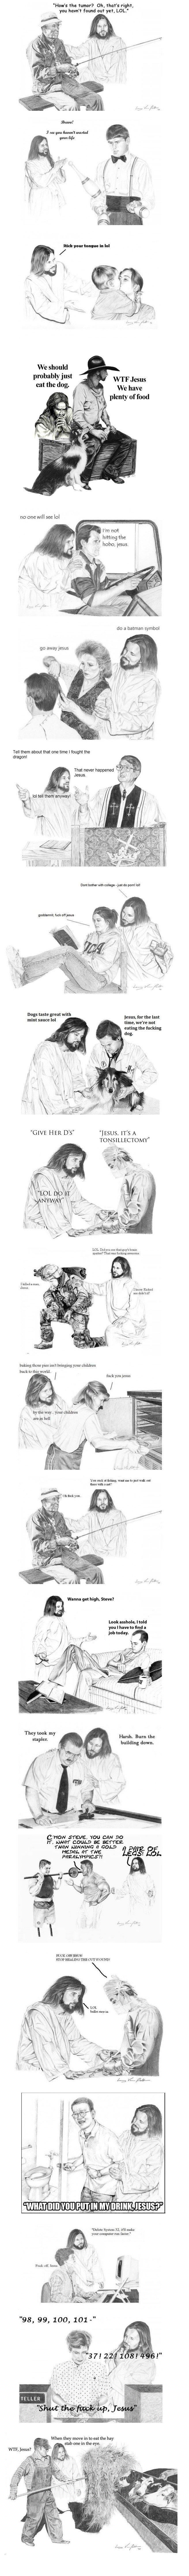 Jesus is a jerk comp.. Part 2: funnyjunk.com/funny_pictures/2869468/Jesus+is+a+jerk+Comp+Part+2/ EDIT: Front page, you guys rock. Jerk Jesus be with you.. Howls Jesus